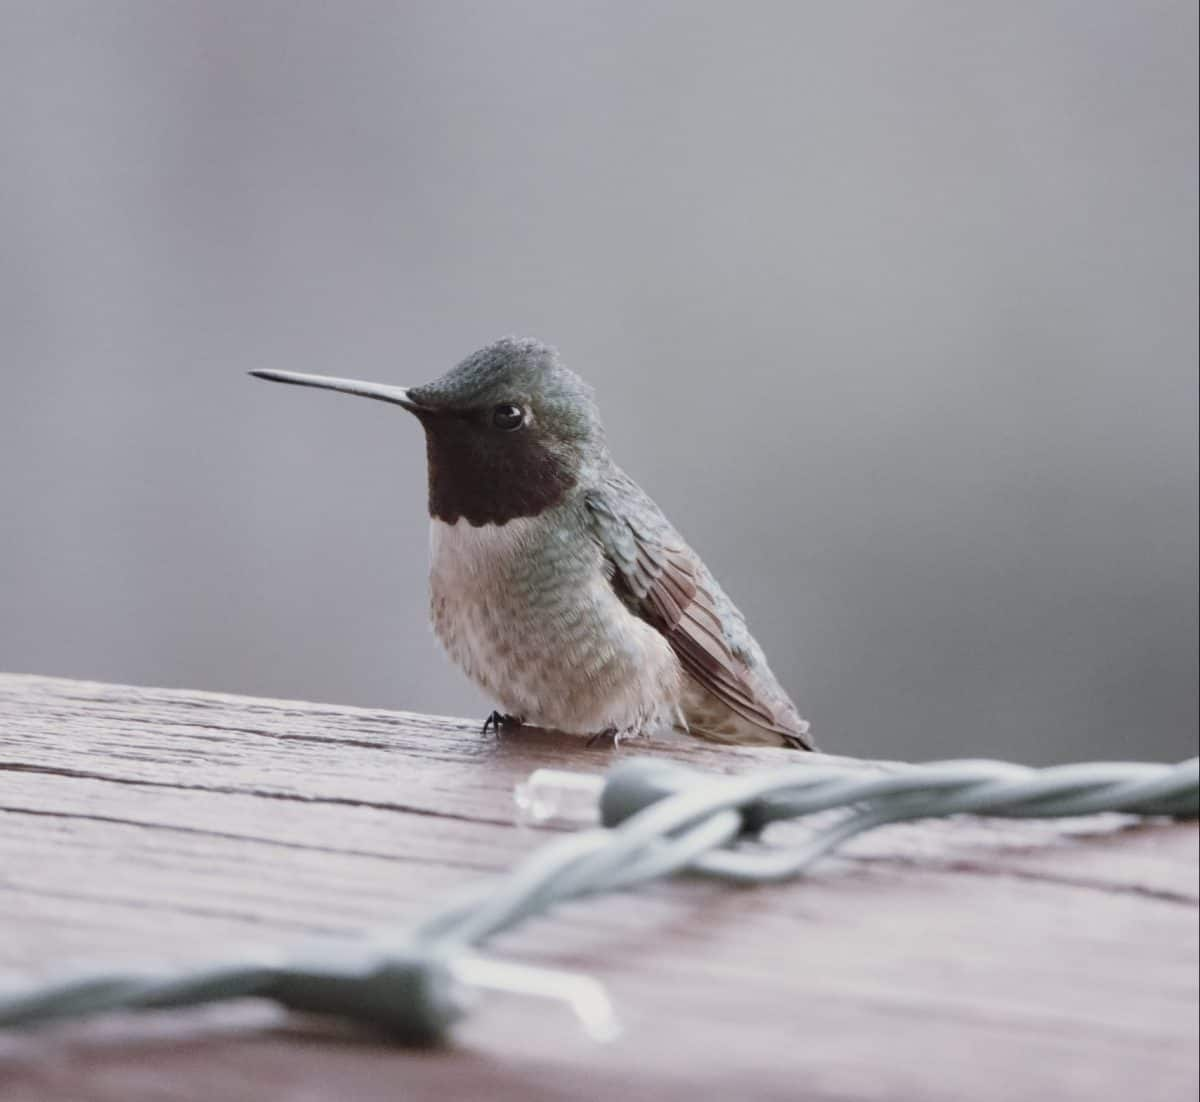 Hummingbird on a wood railing